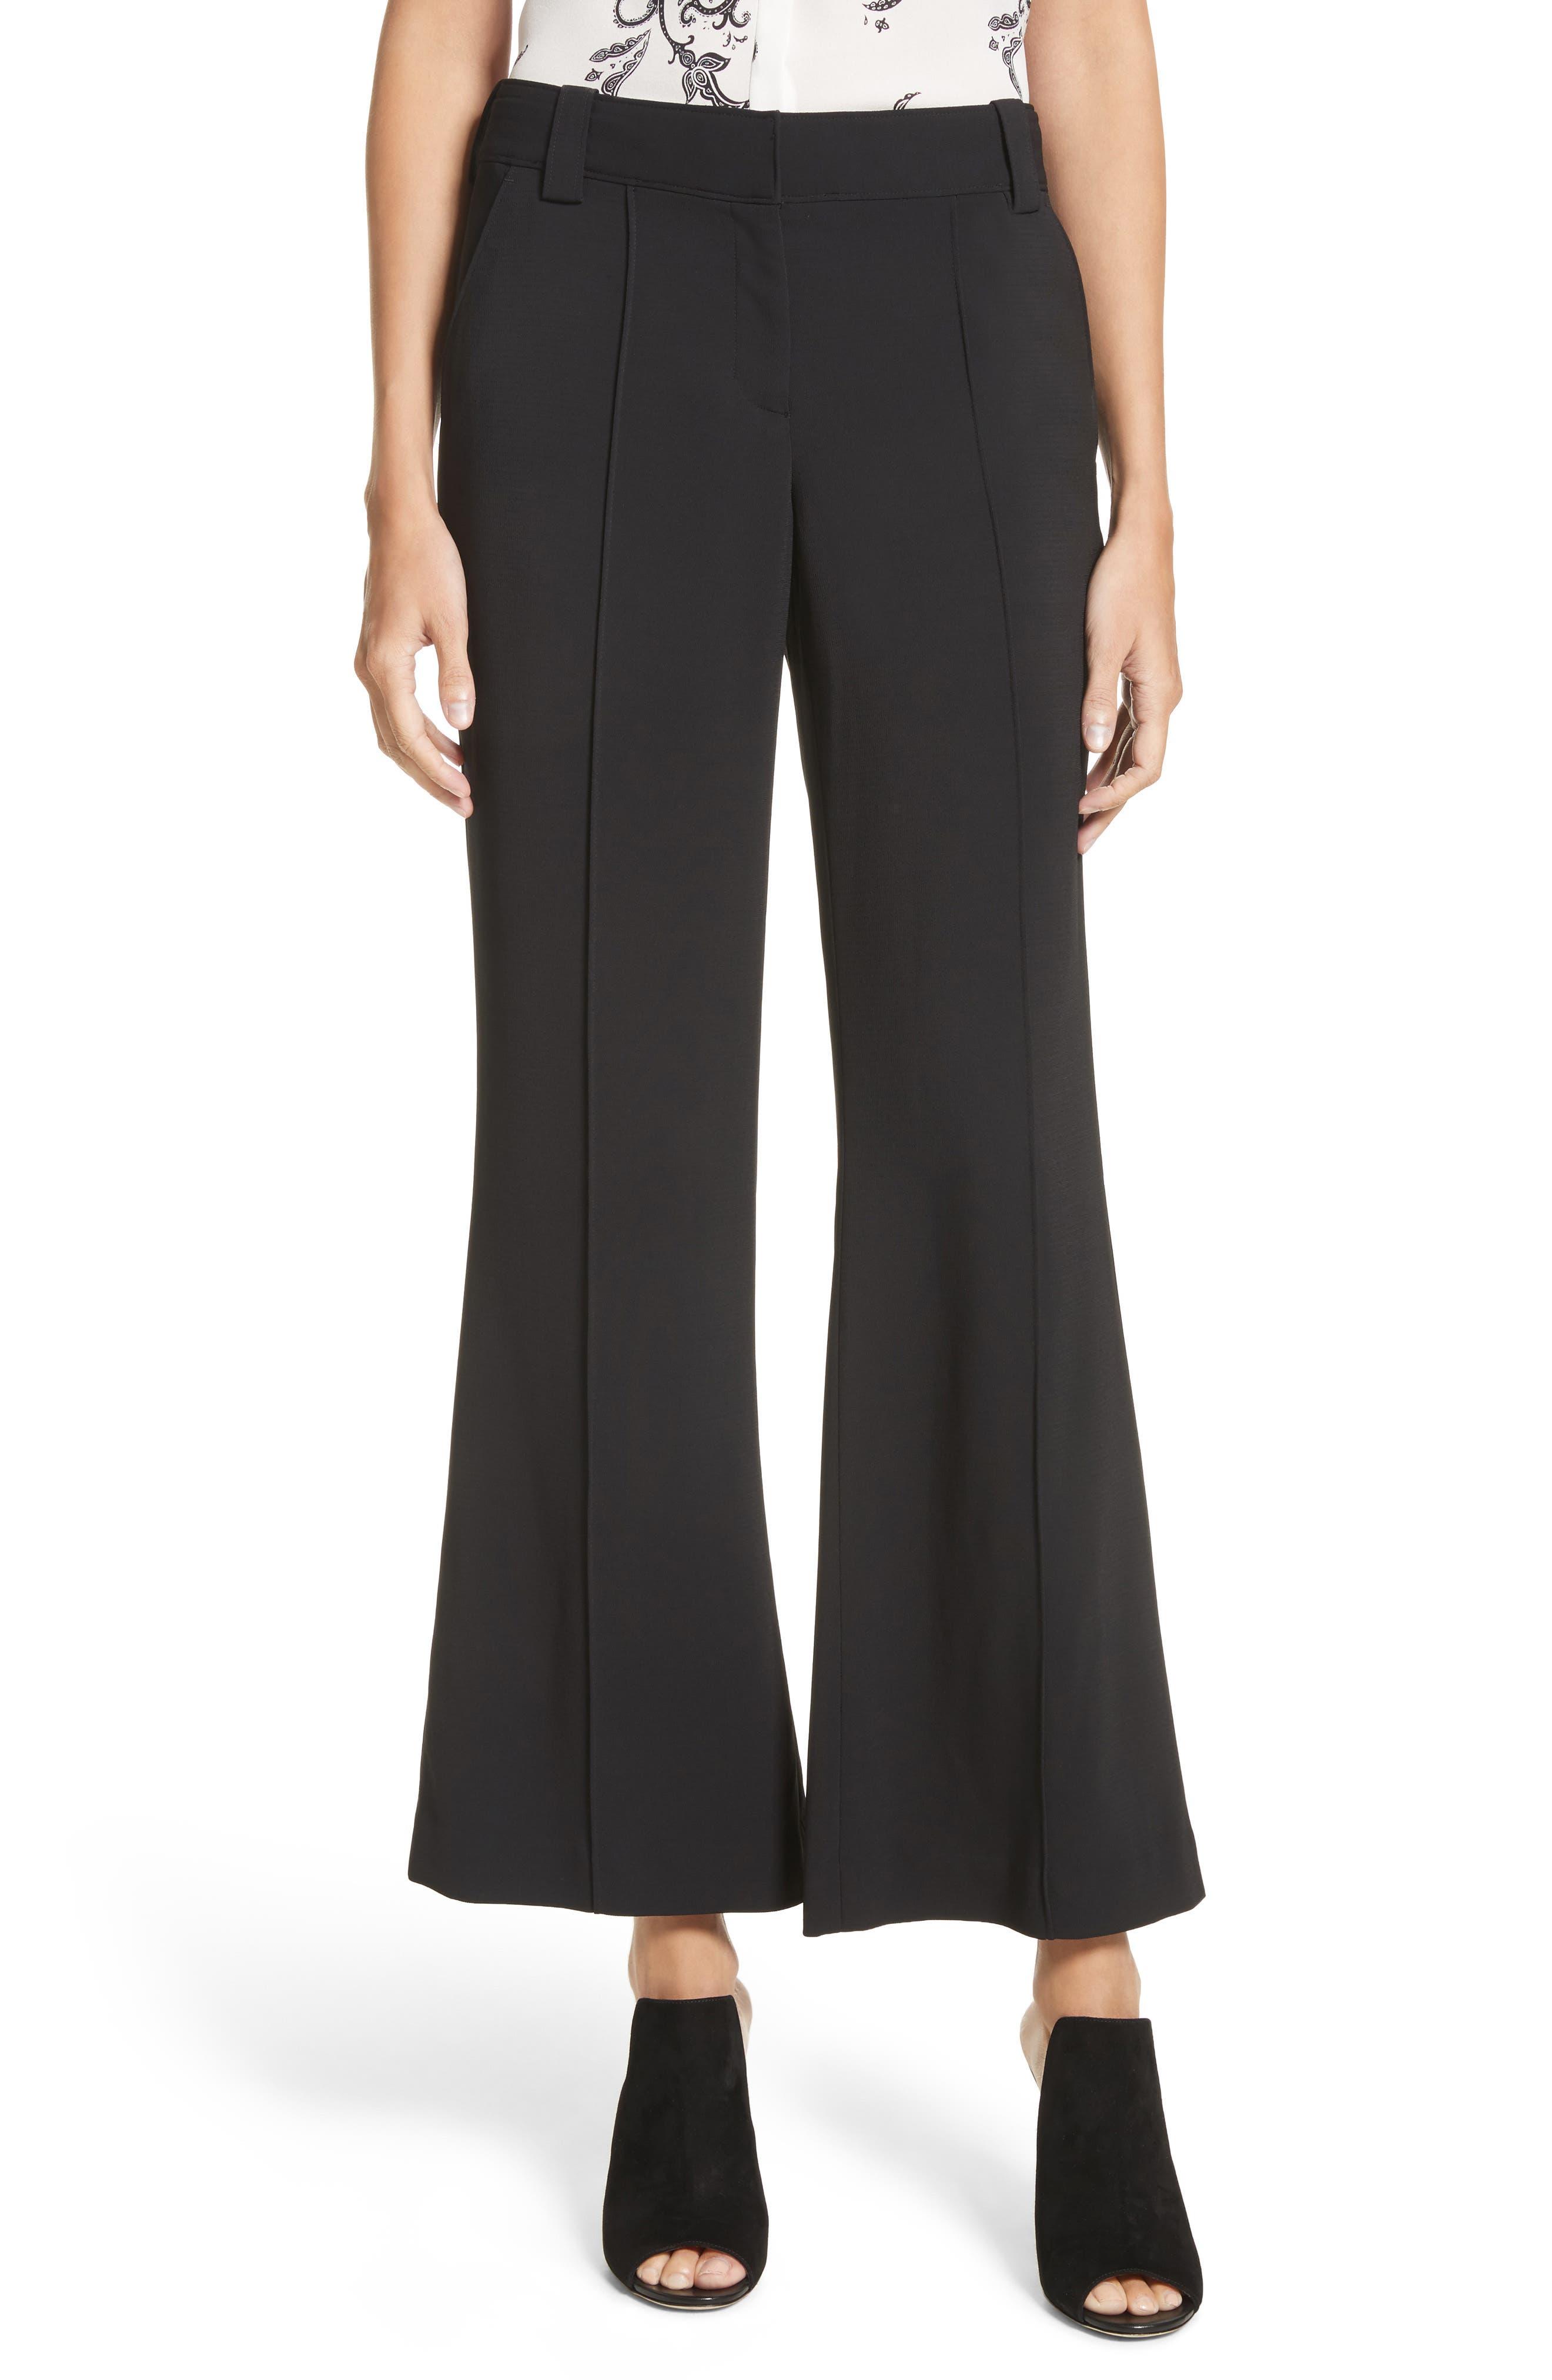 Felix Crop Flare Pants,                         Main,                         color, Black